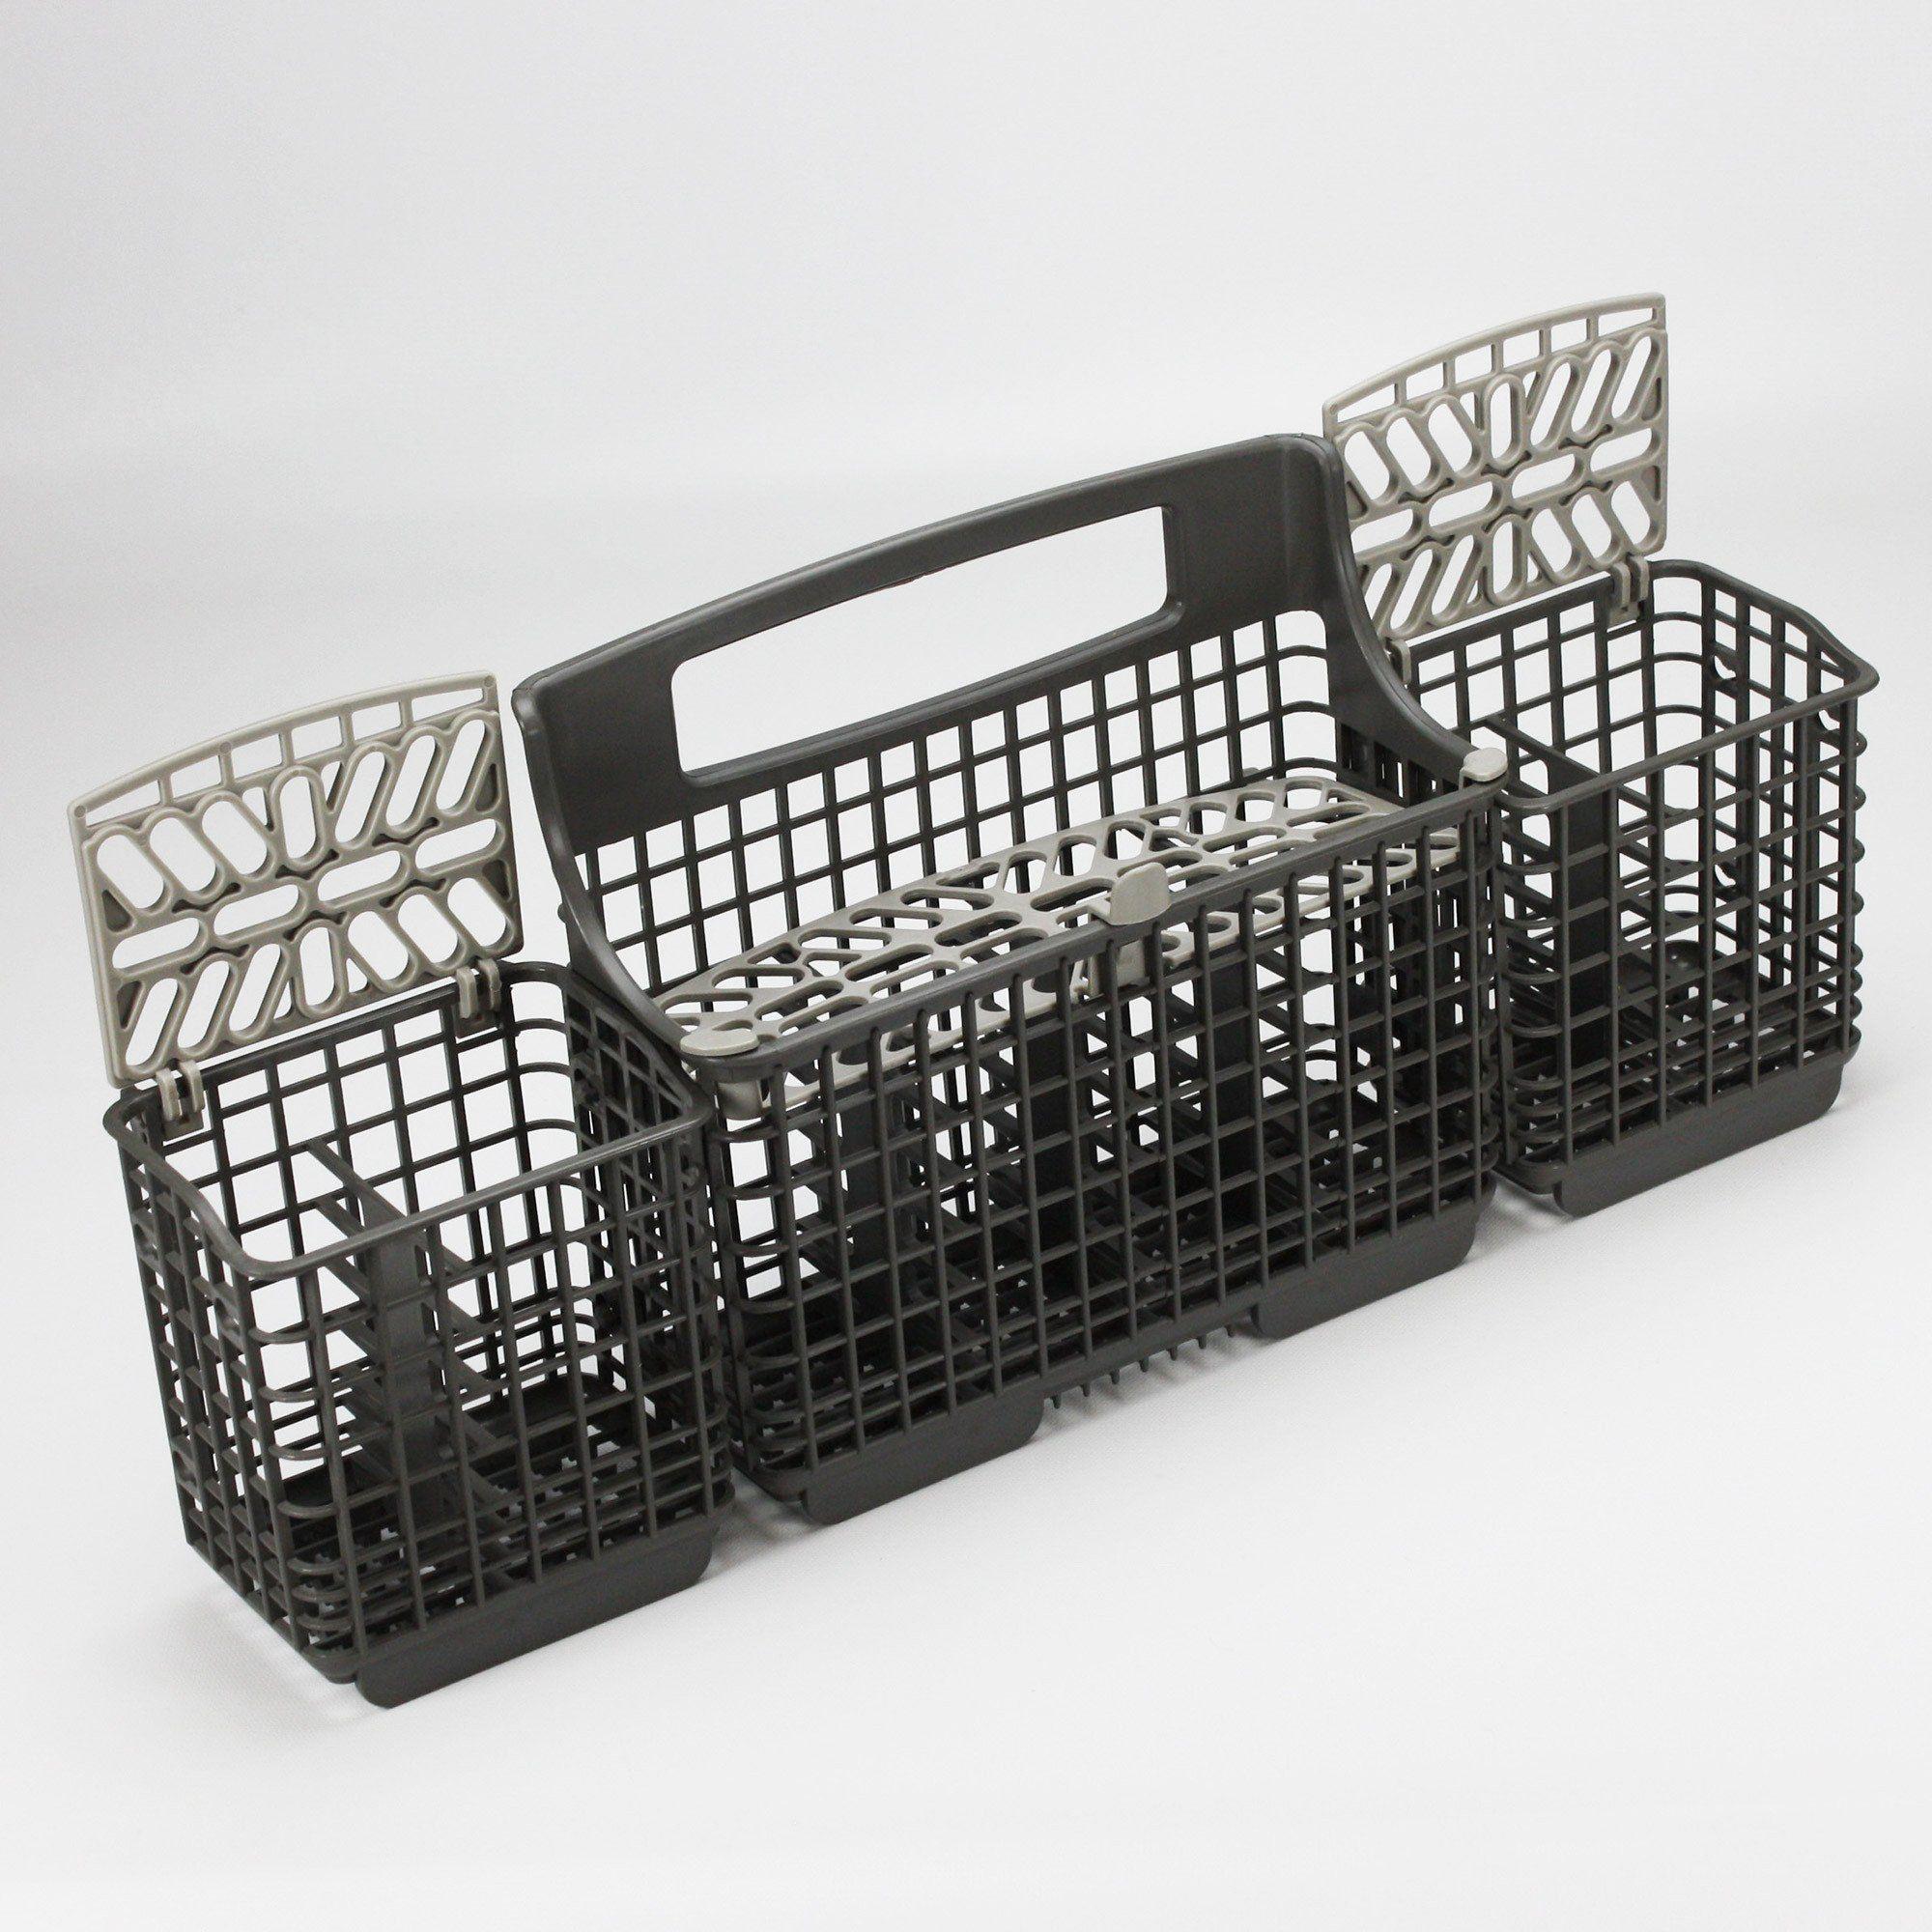 8562084 Whirlpool Dishwasher Silverware Utensil Basket Whirlpool